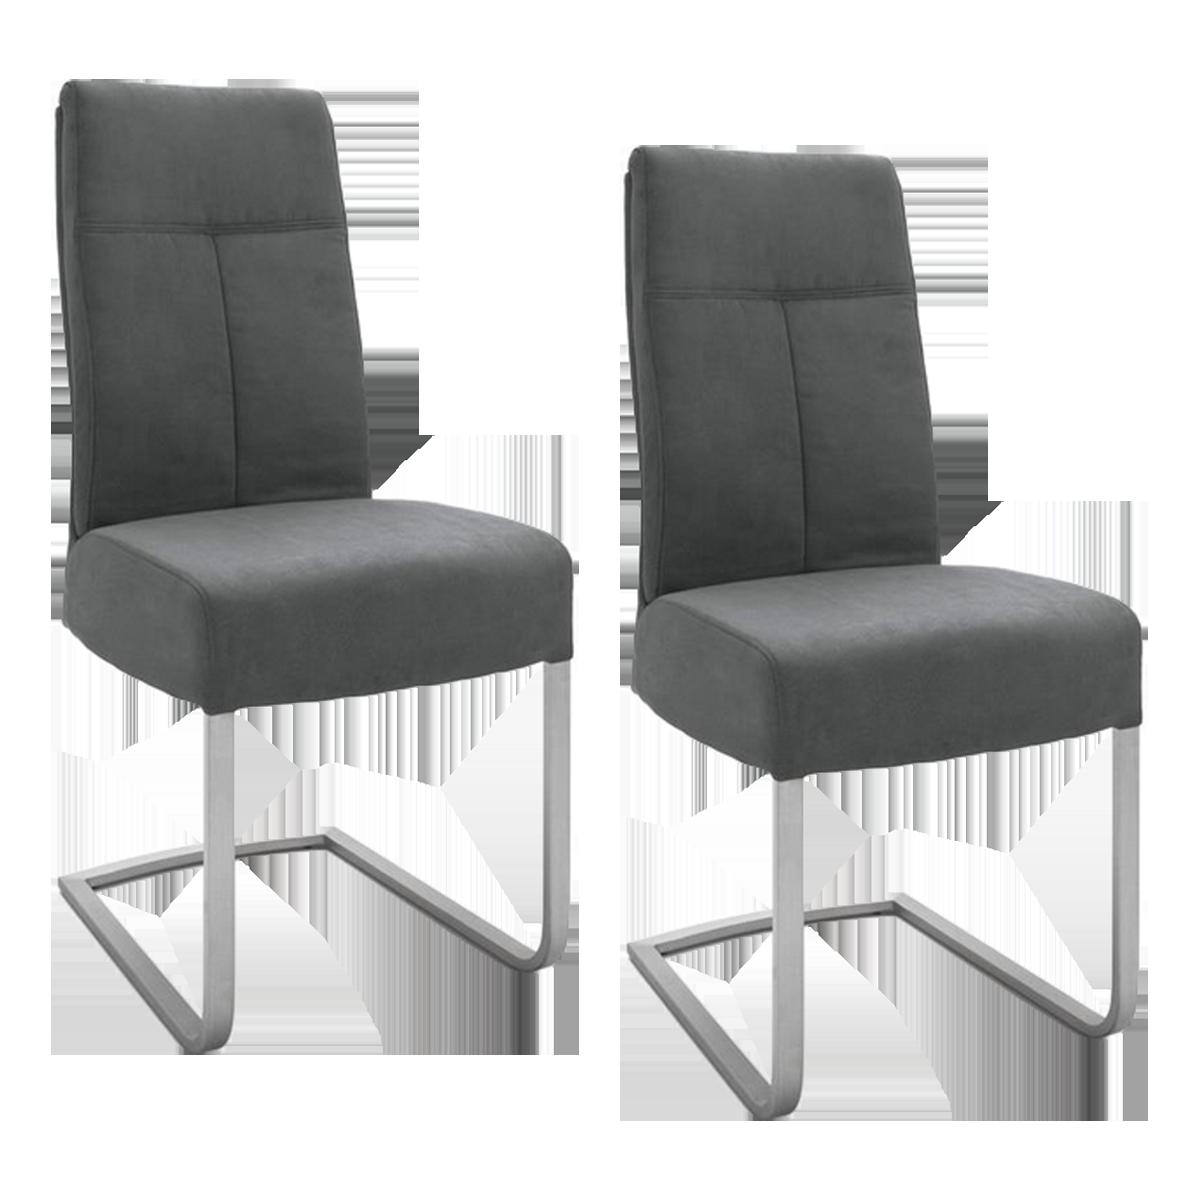 2x mca furniture schwingstuhl talena gestell flachrohr. Black Bedroom Furniture Sets. Home Design Ideas